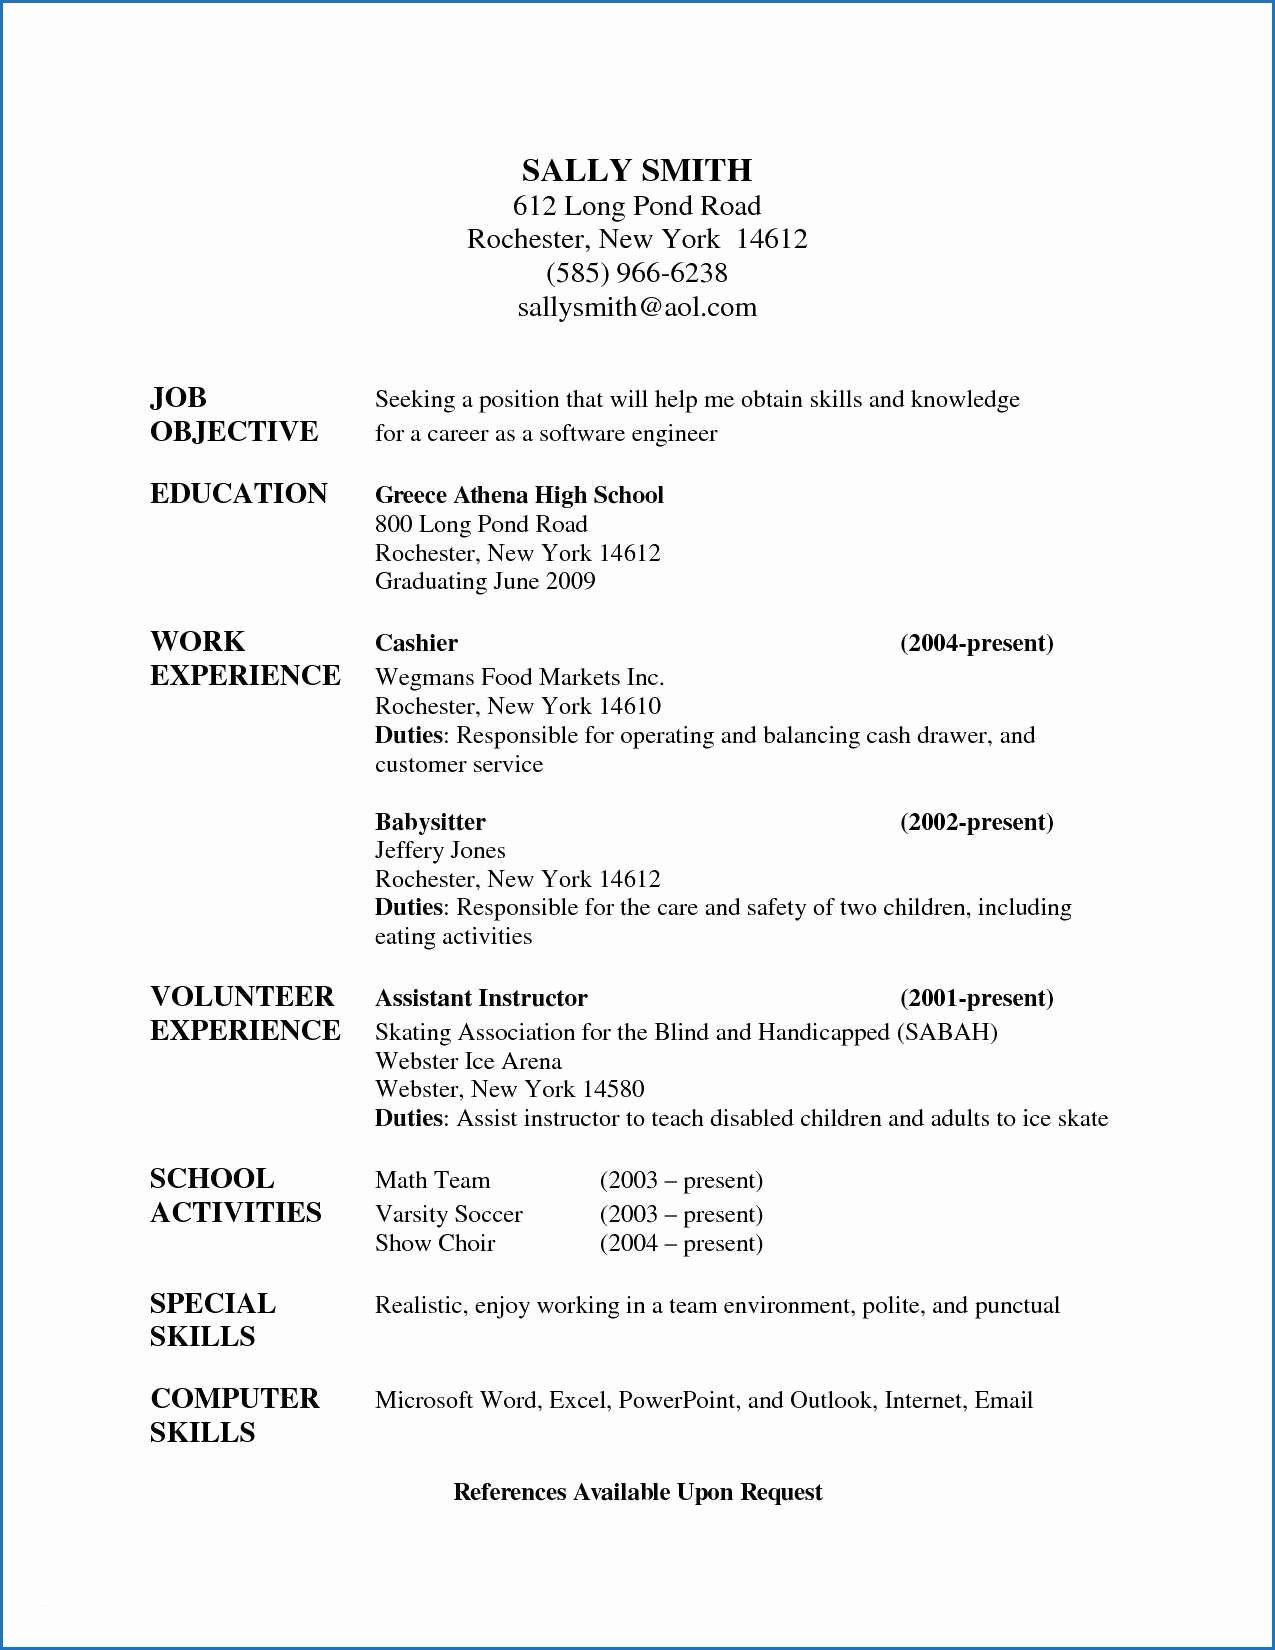 Nanny Job Description Resume Unique 10 Child Care Worker Job Description Examples Babysitter Jobs Nanny Job Description Job Resume Examples